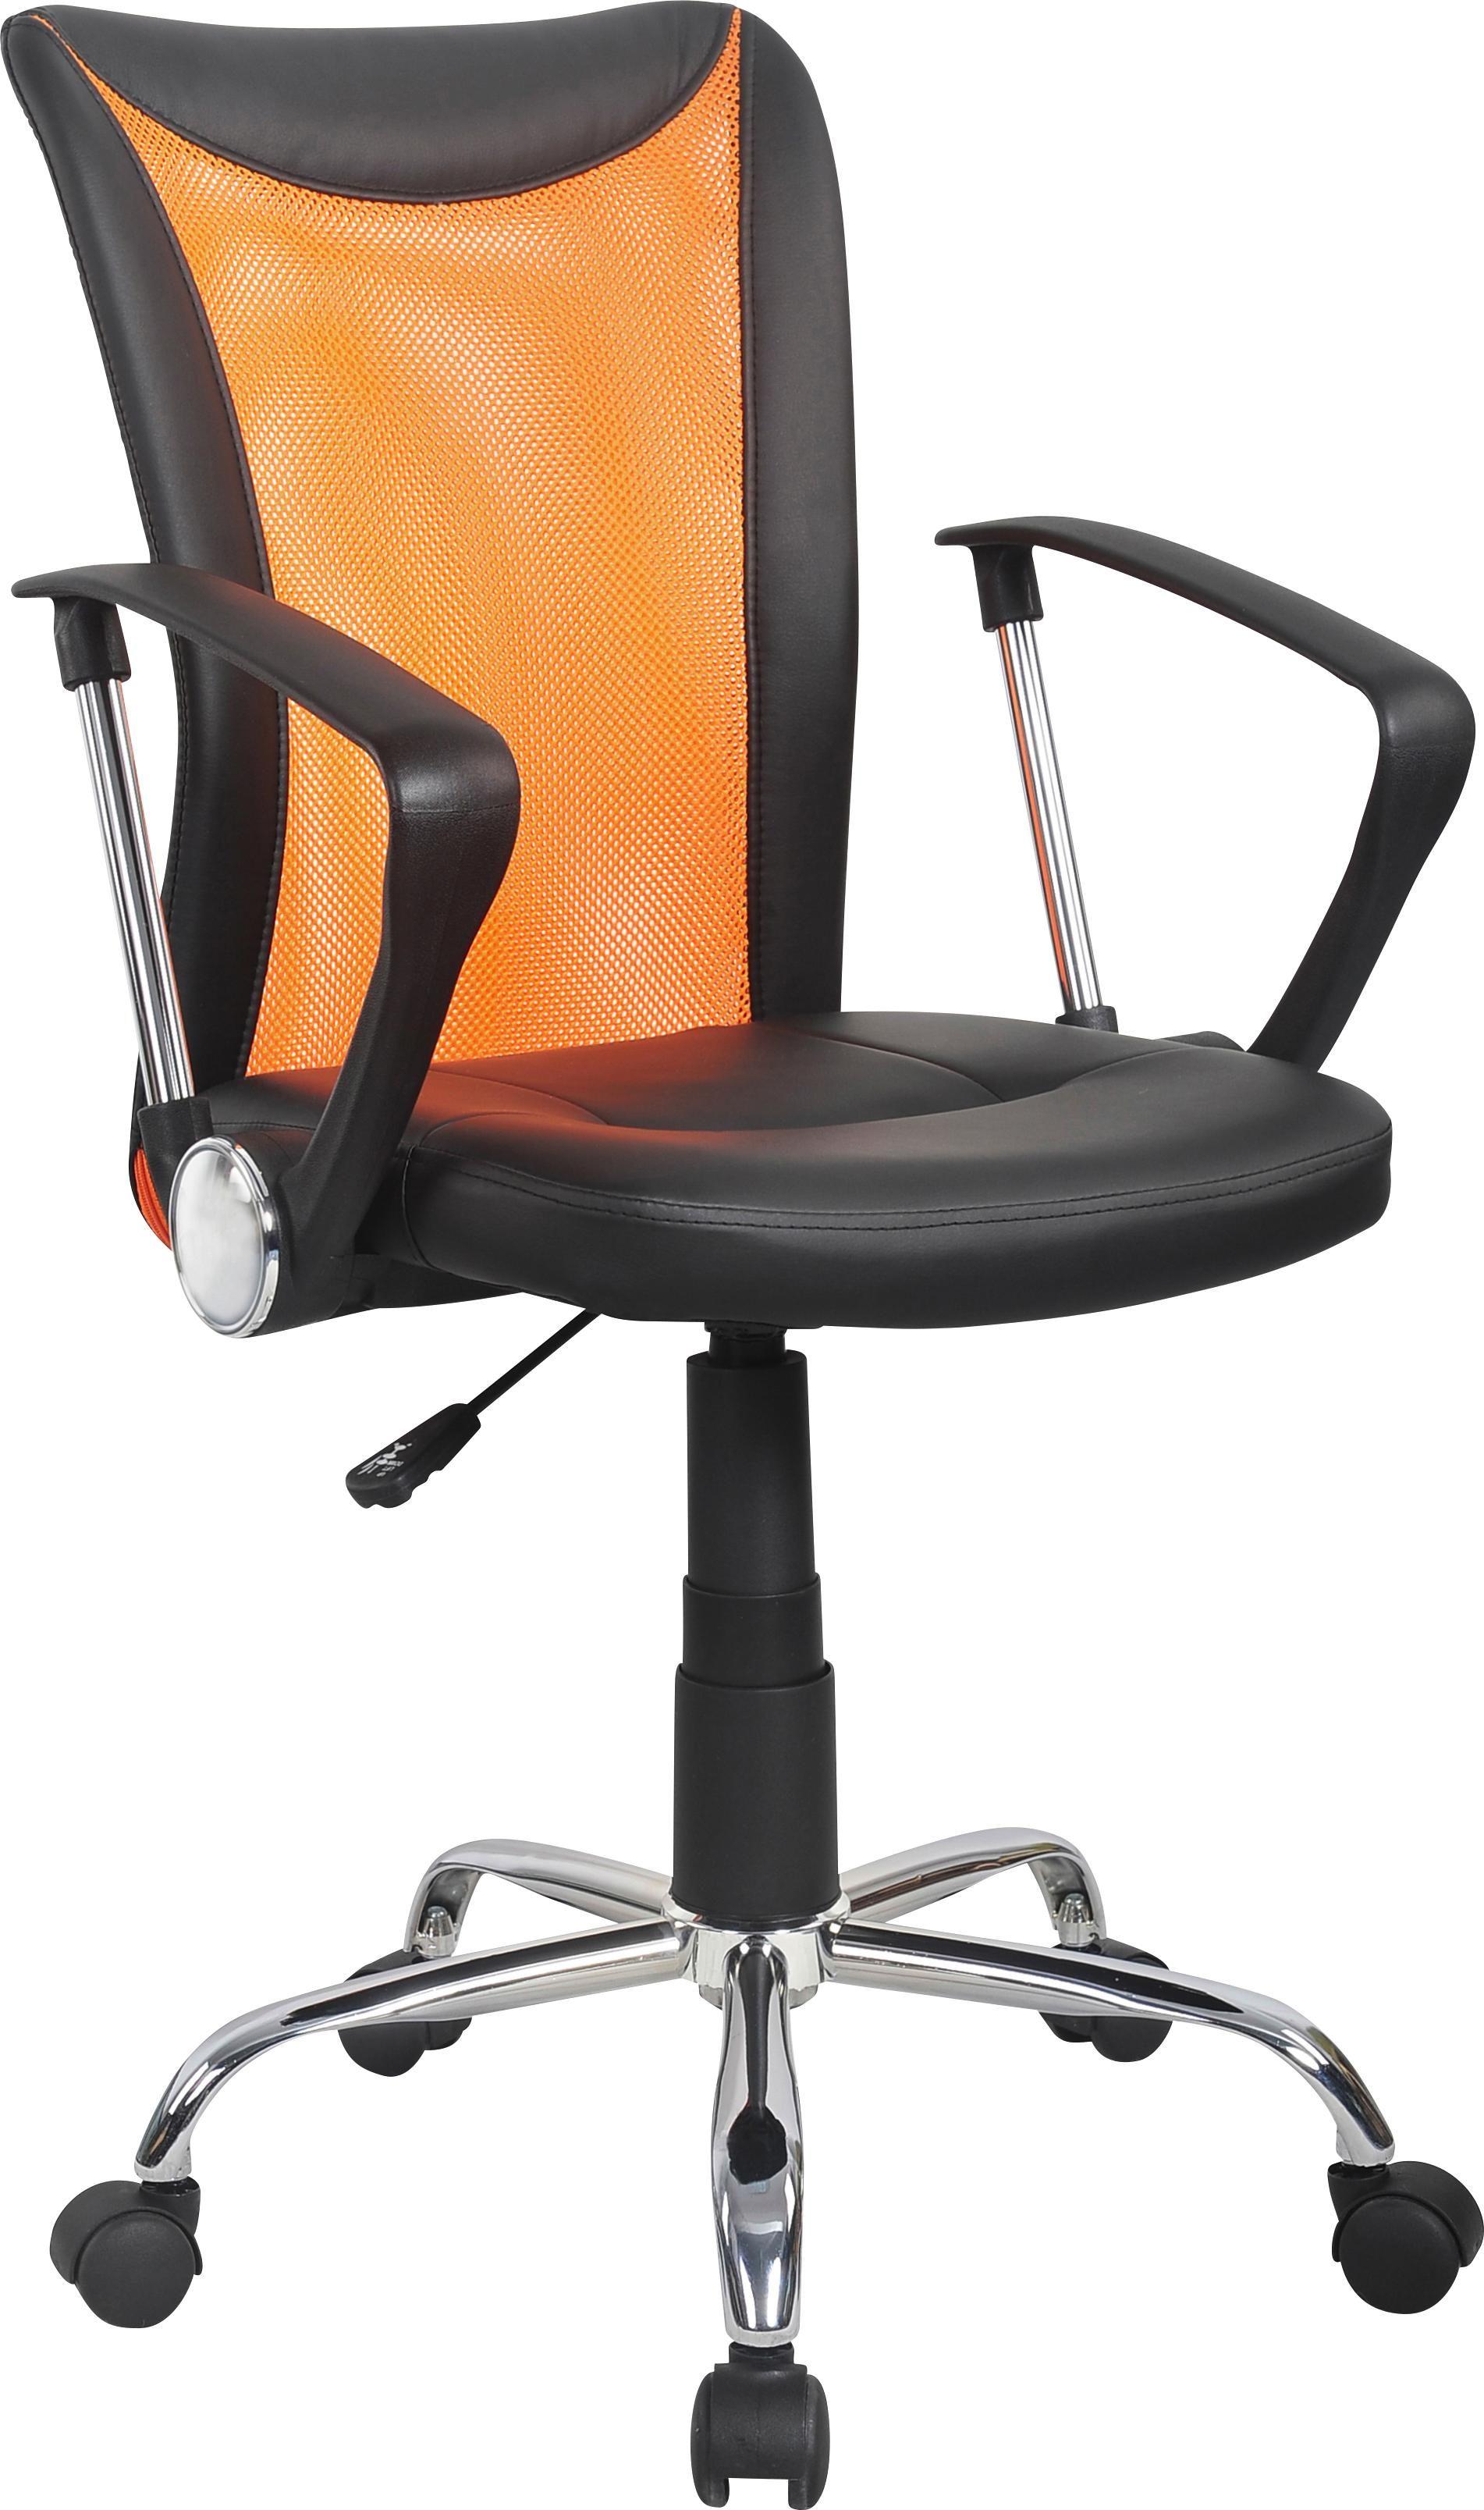 Otočná Židle Vanessa - oranžová/černá, Moderní, kov/textilie (47/88,5-98,50/54cm)